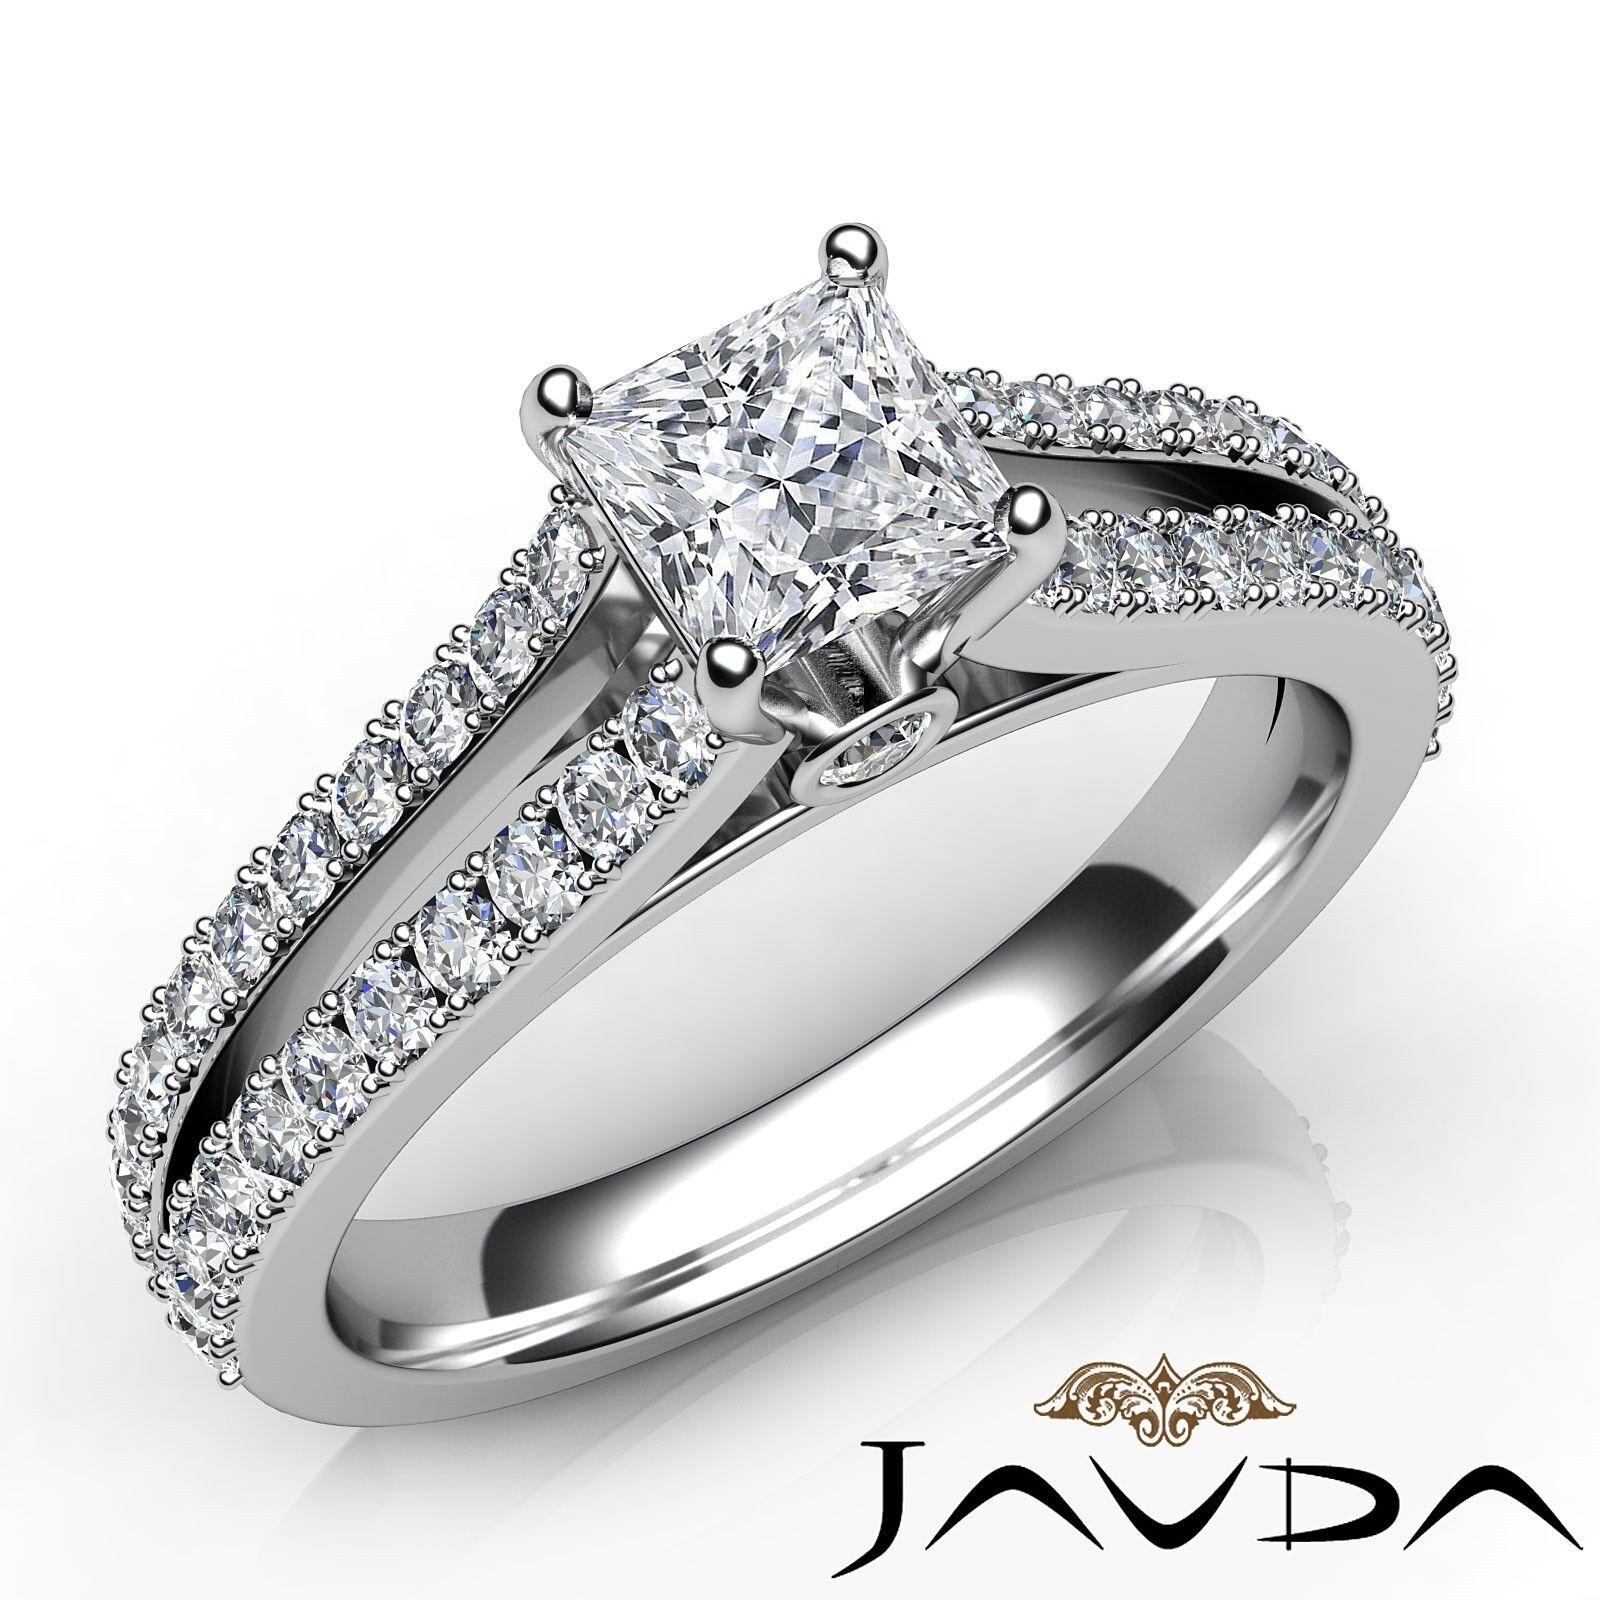 1.45ctw Natural 100% Princess Diamond Engagement Ring GIA I-SI2 White Gold Rings